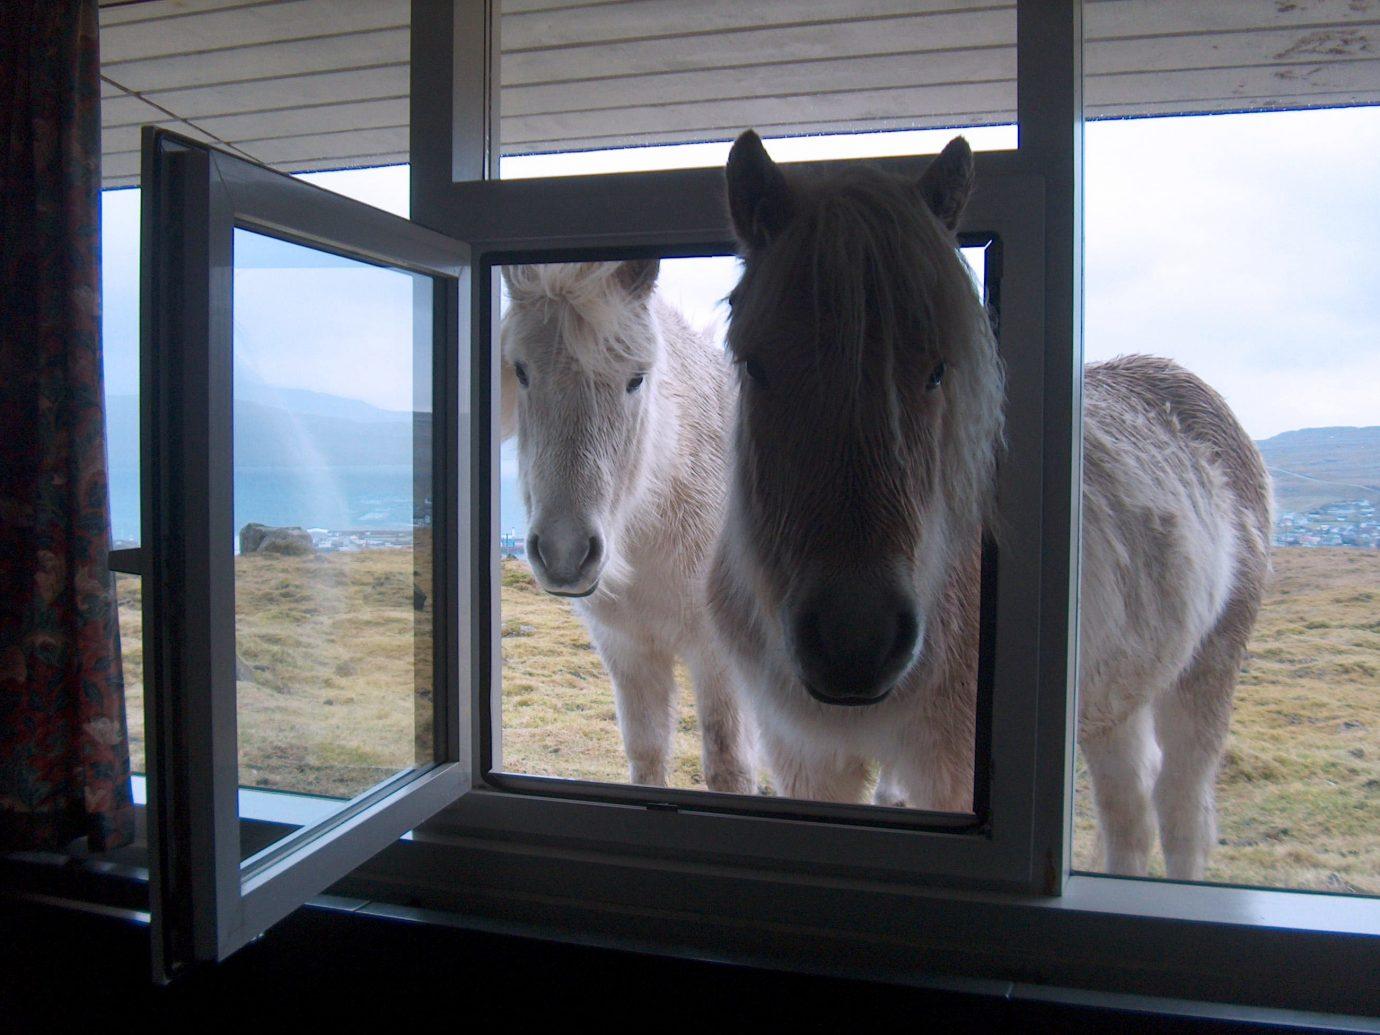 Trip Ideas window horse looking mammal indoor standing animal horse like mammal mane stallion staring day